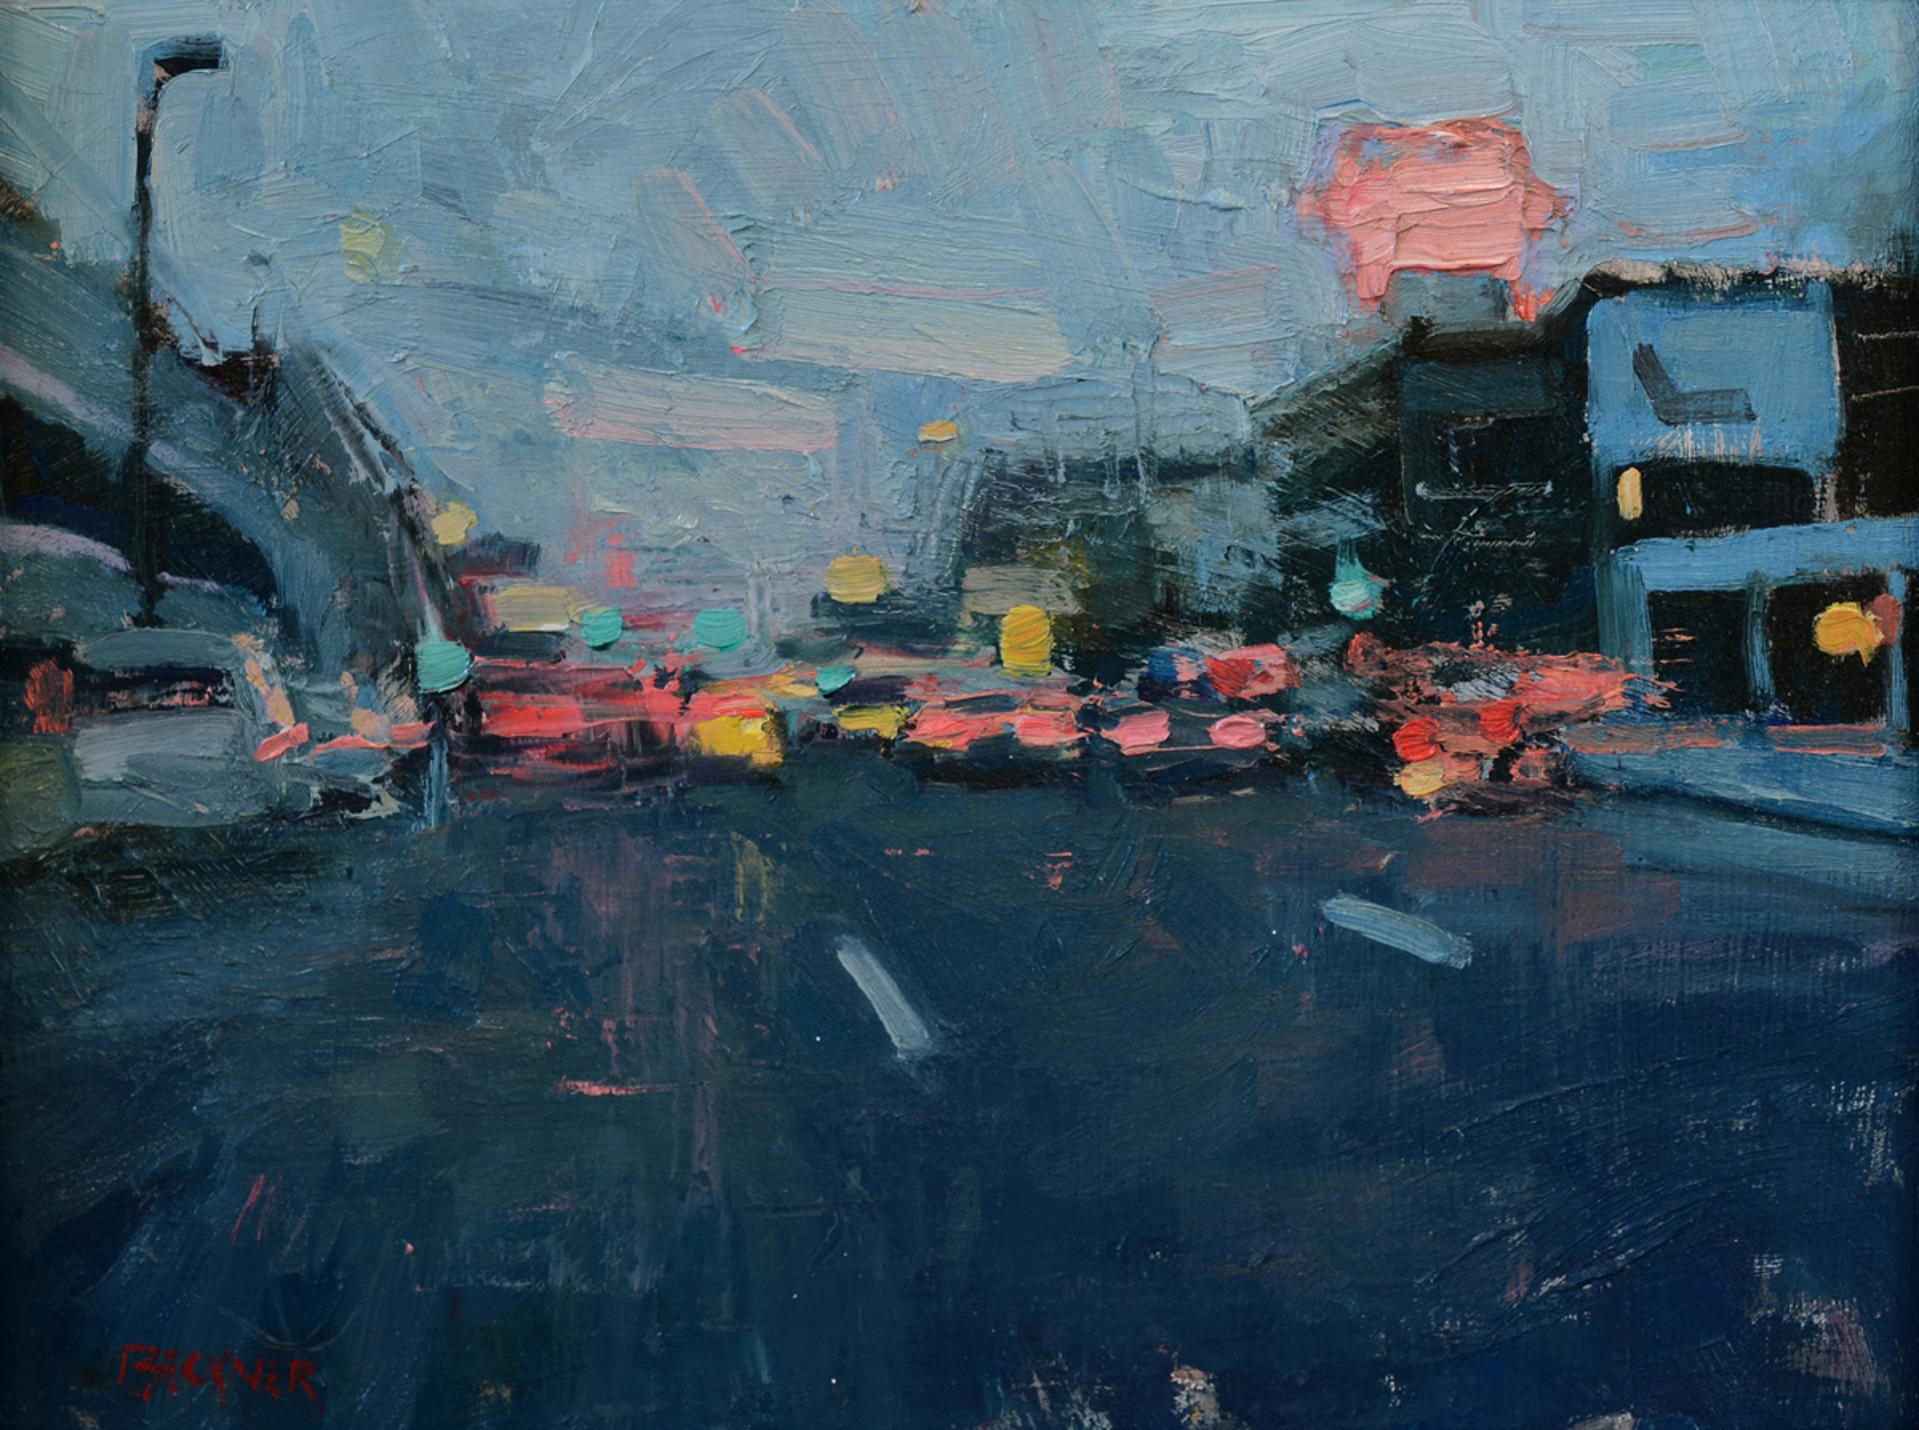 Haze by Jim Beckner